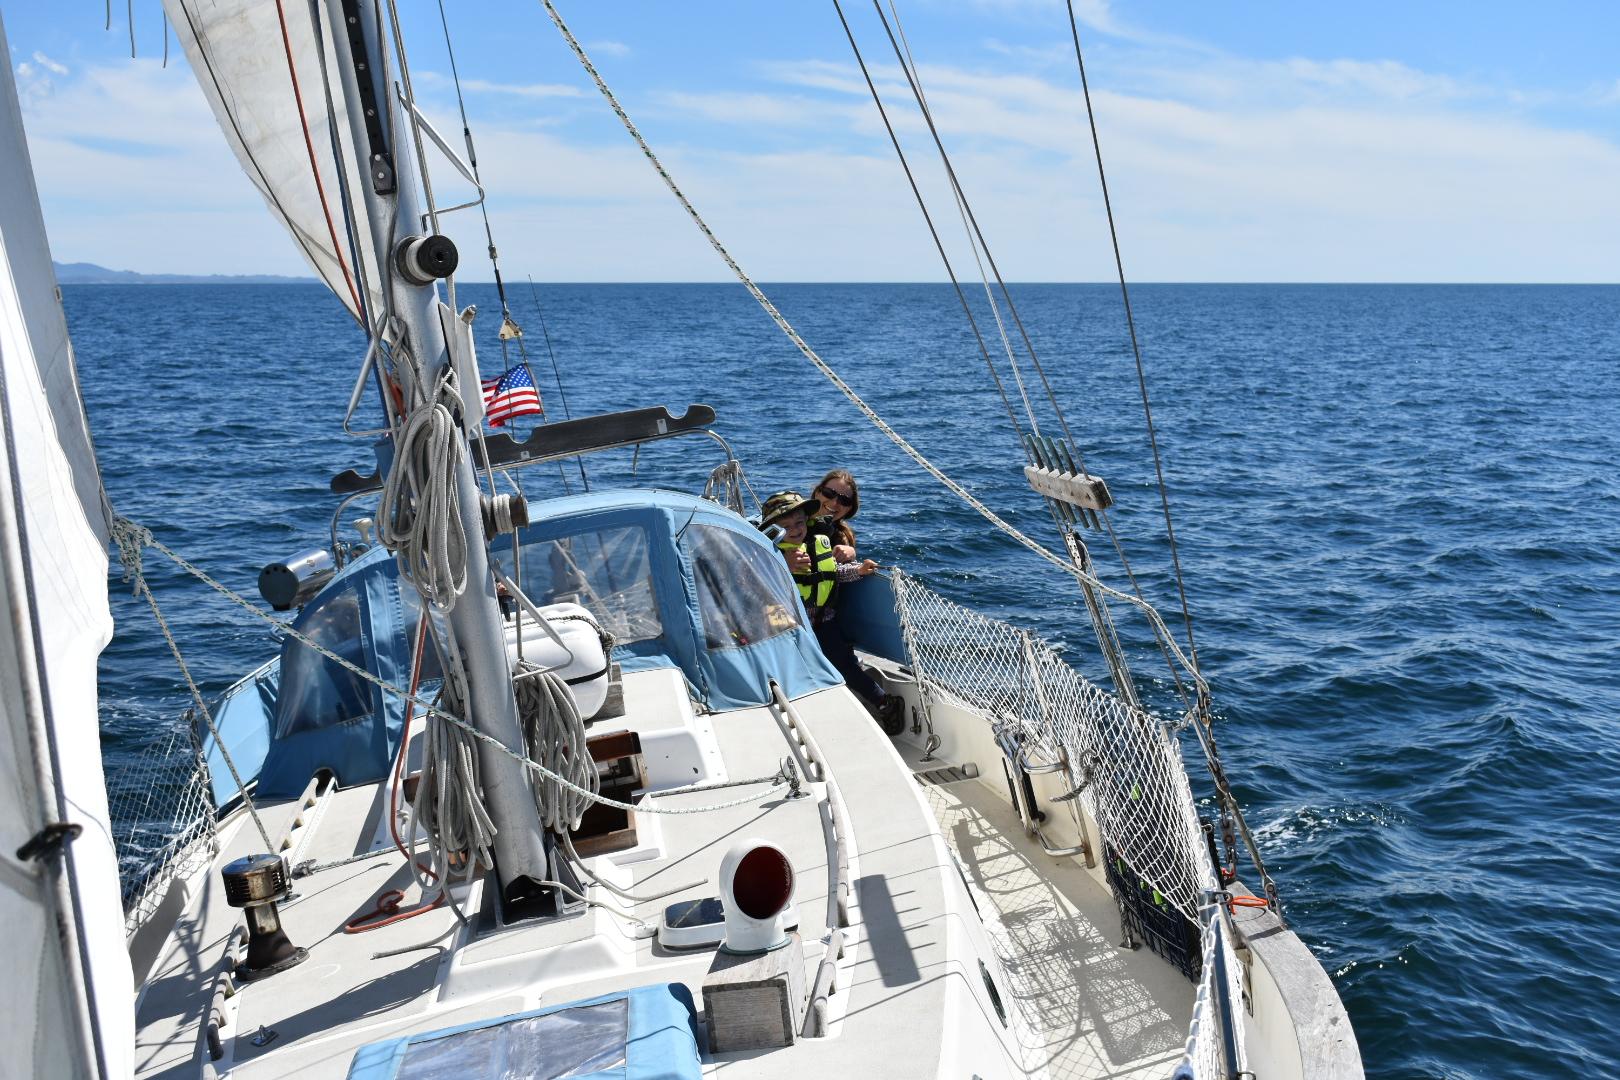 Sailing in the sunshine.